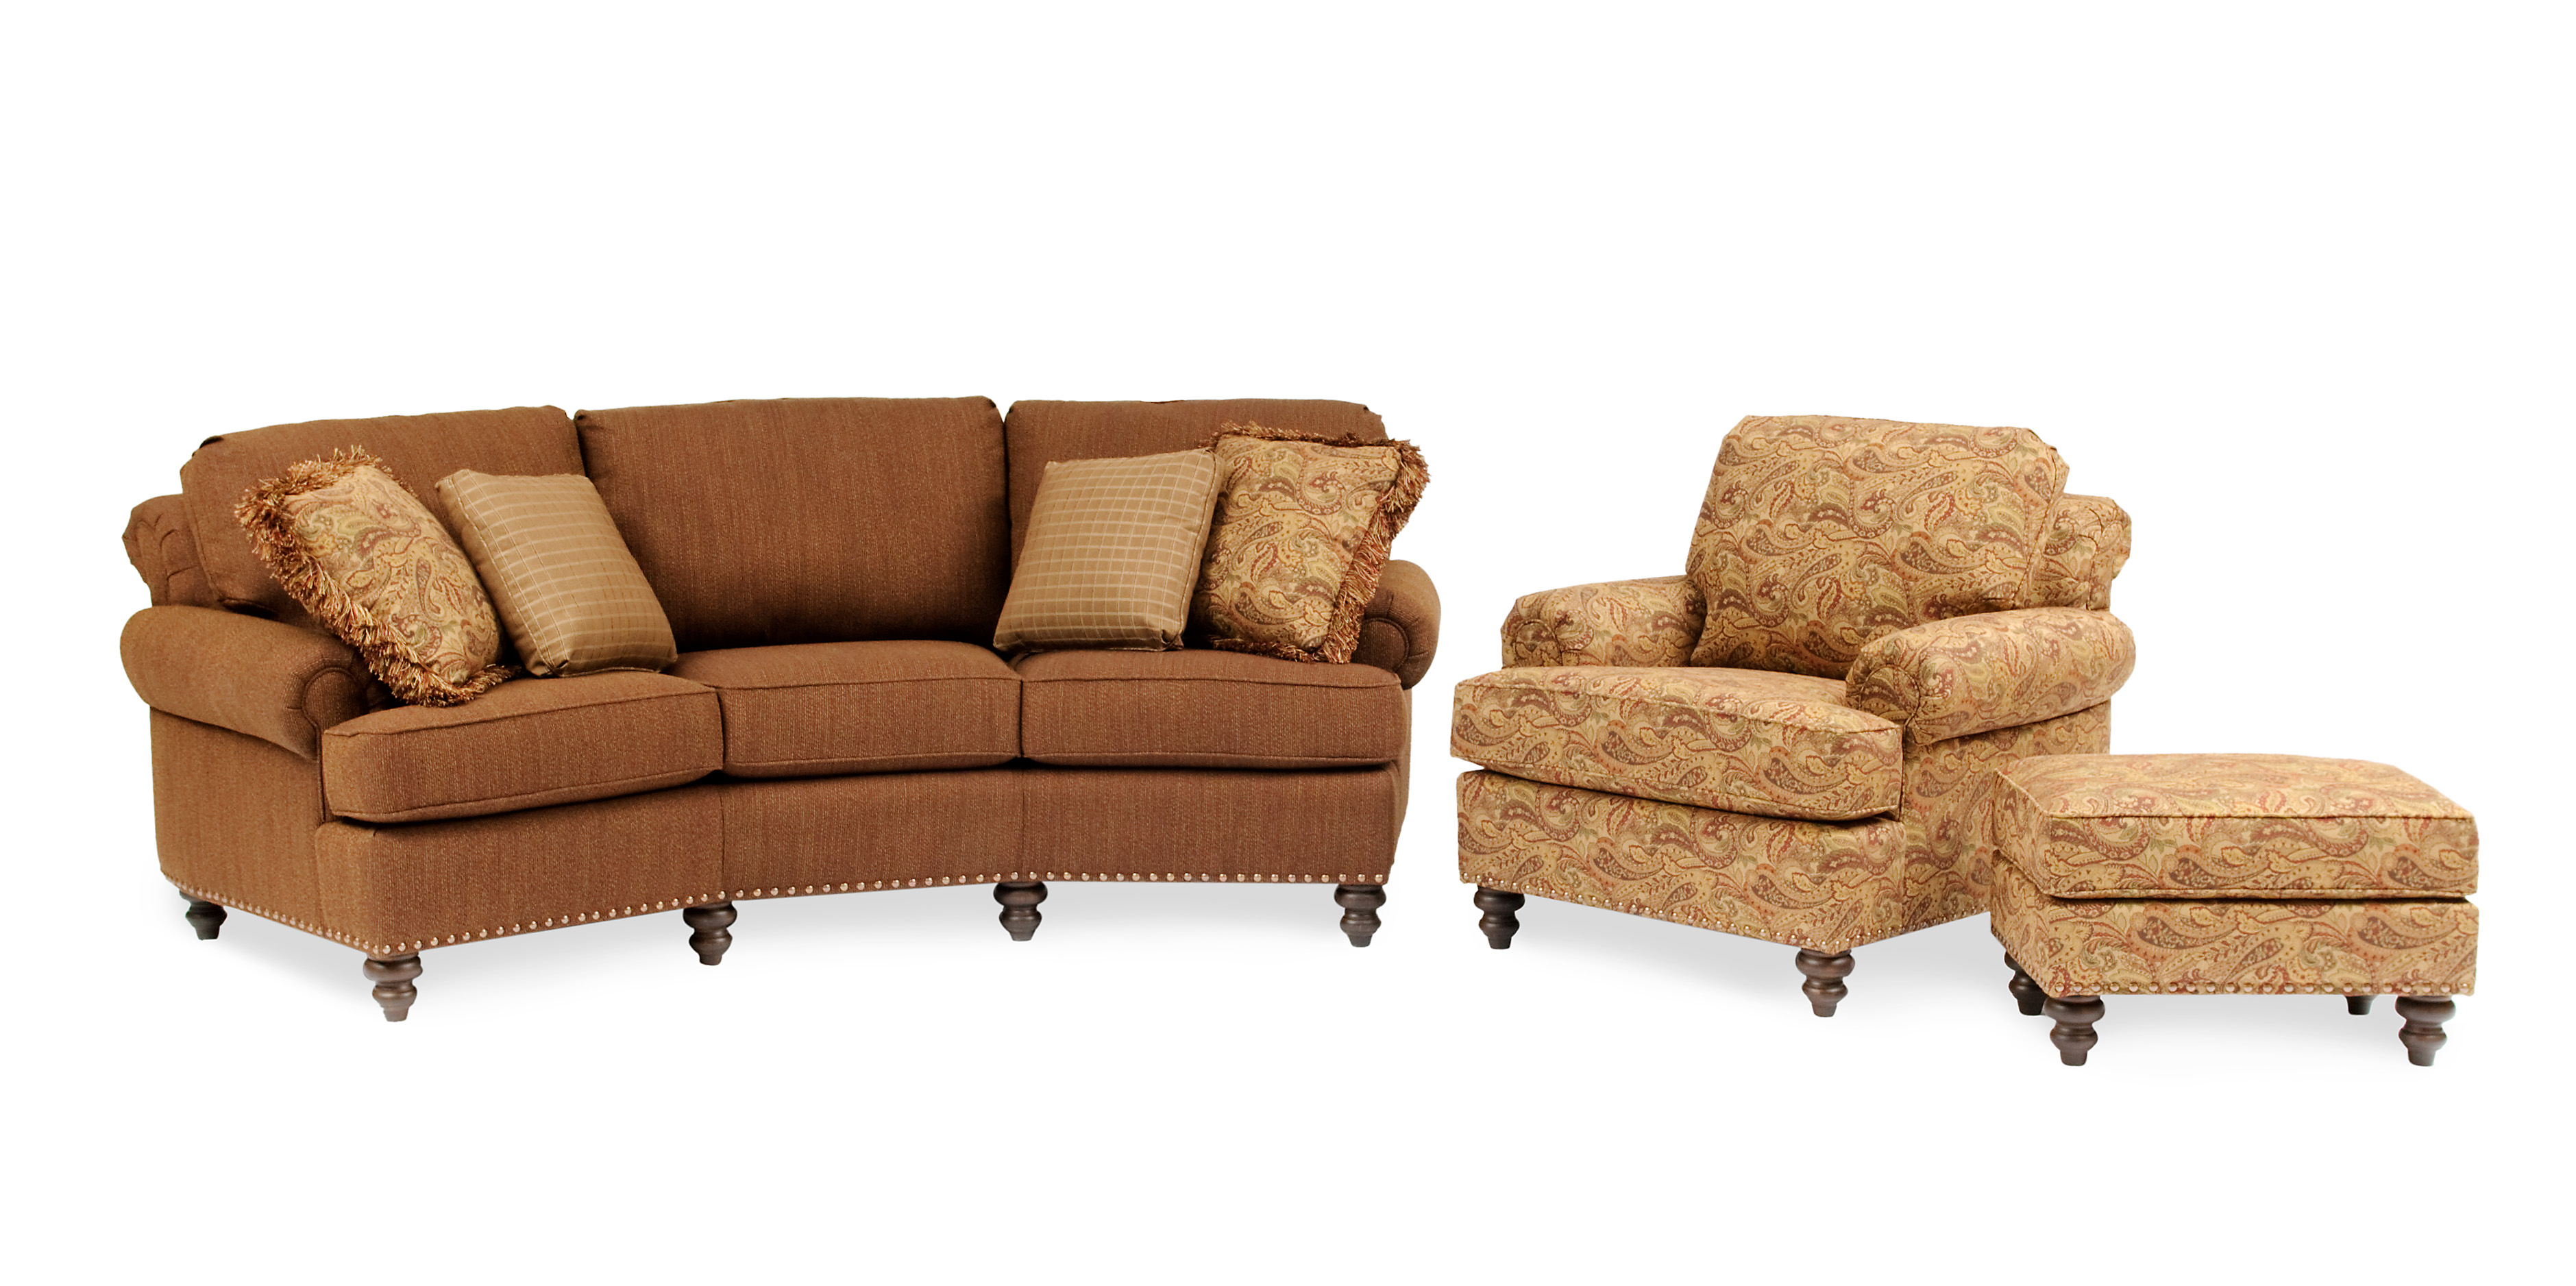 conversation sofas reviews condo size sofa beds toronto saugerties furniture hudson valley